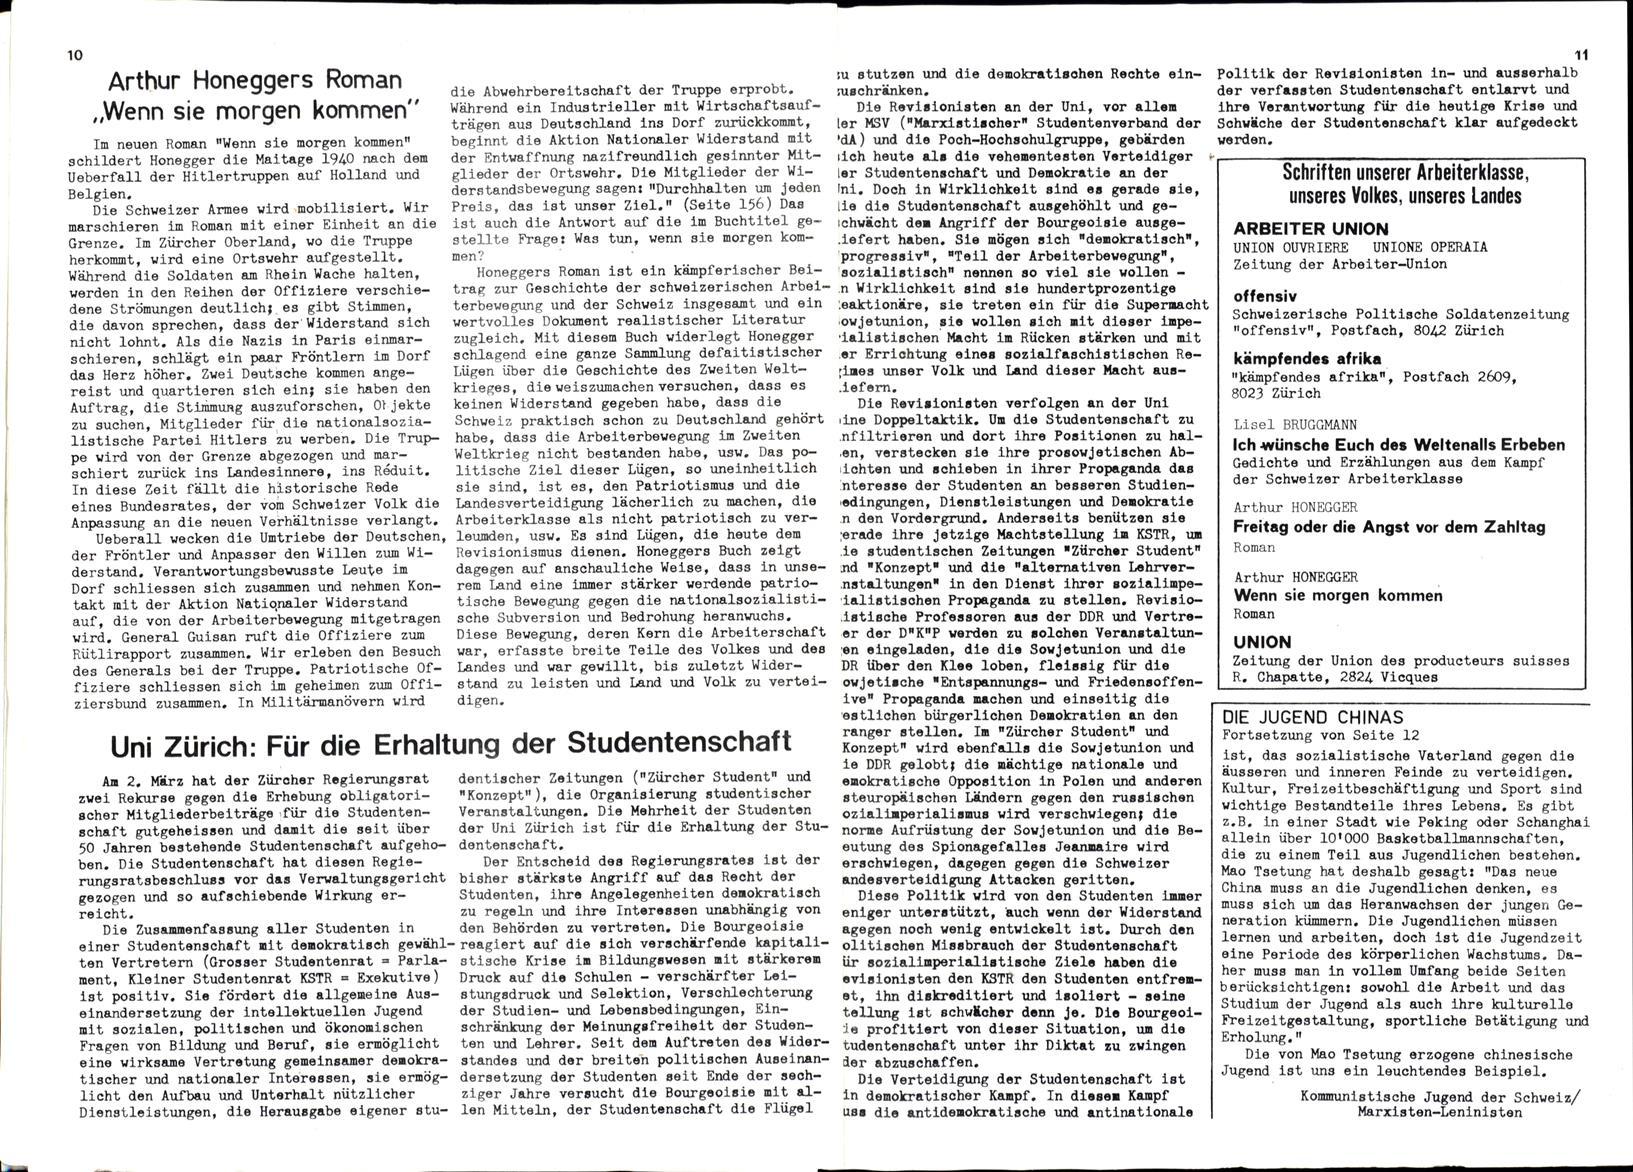 Schweiz_KPSML_Oktober_19770800_113_006